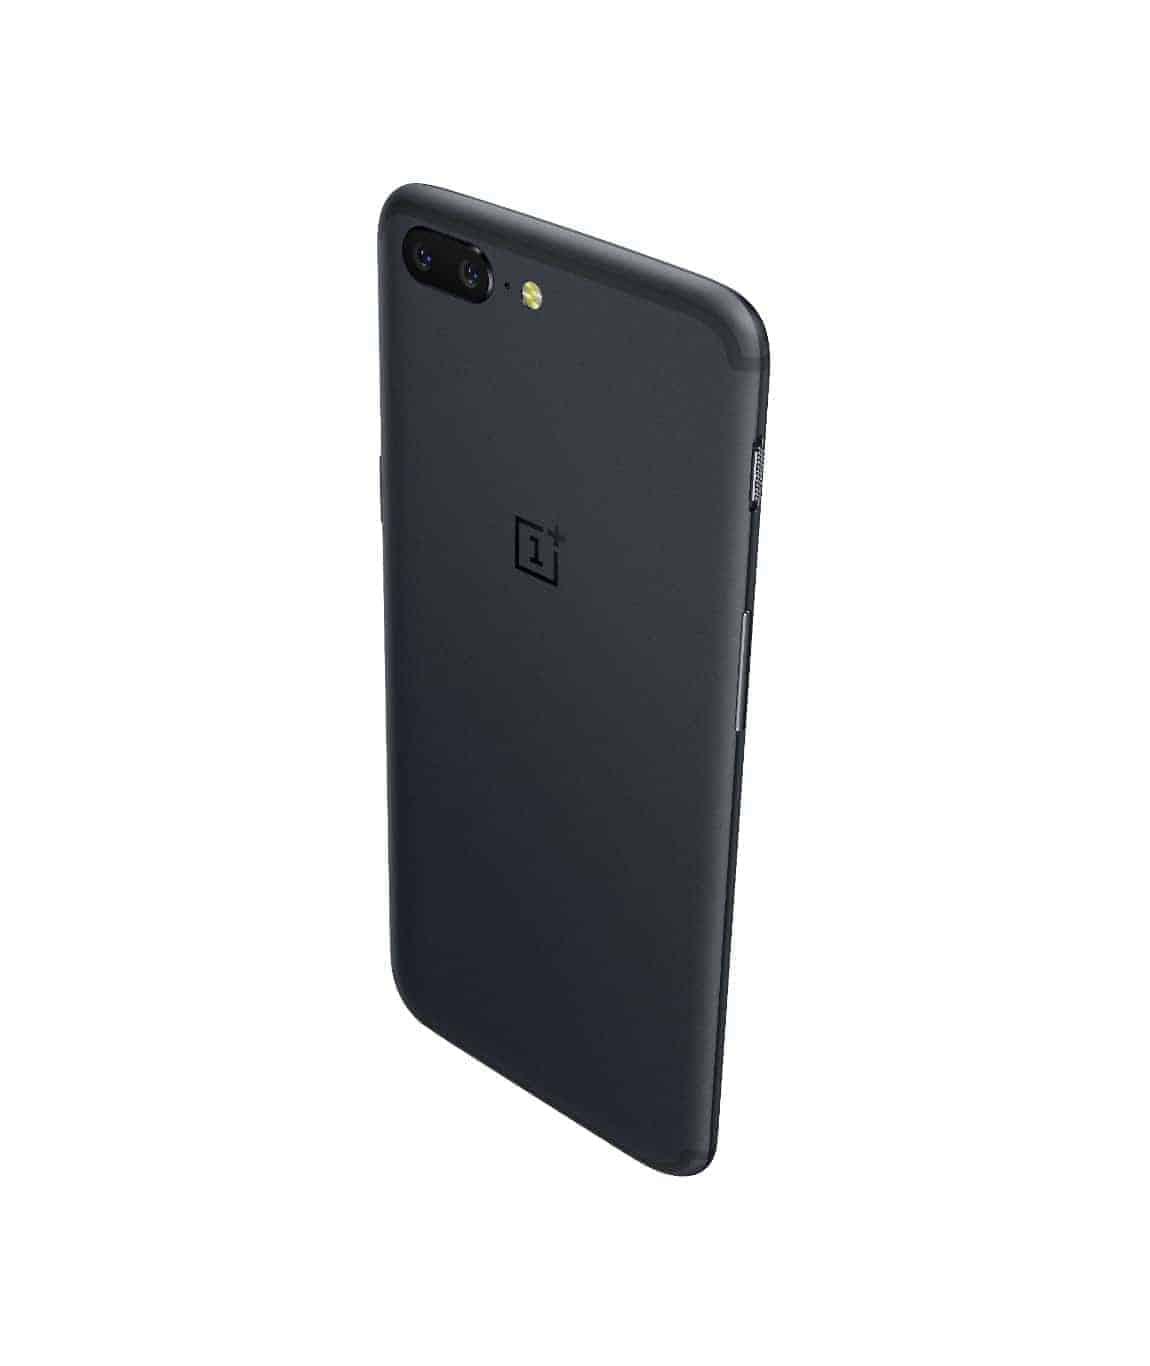 OnePlus 5 Slate Gray 1